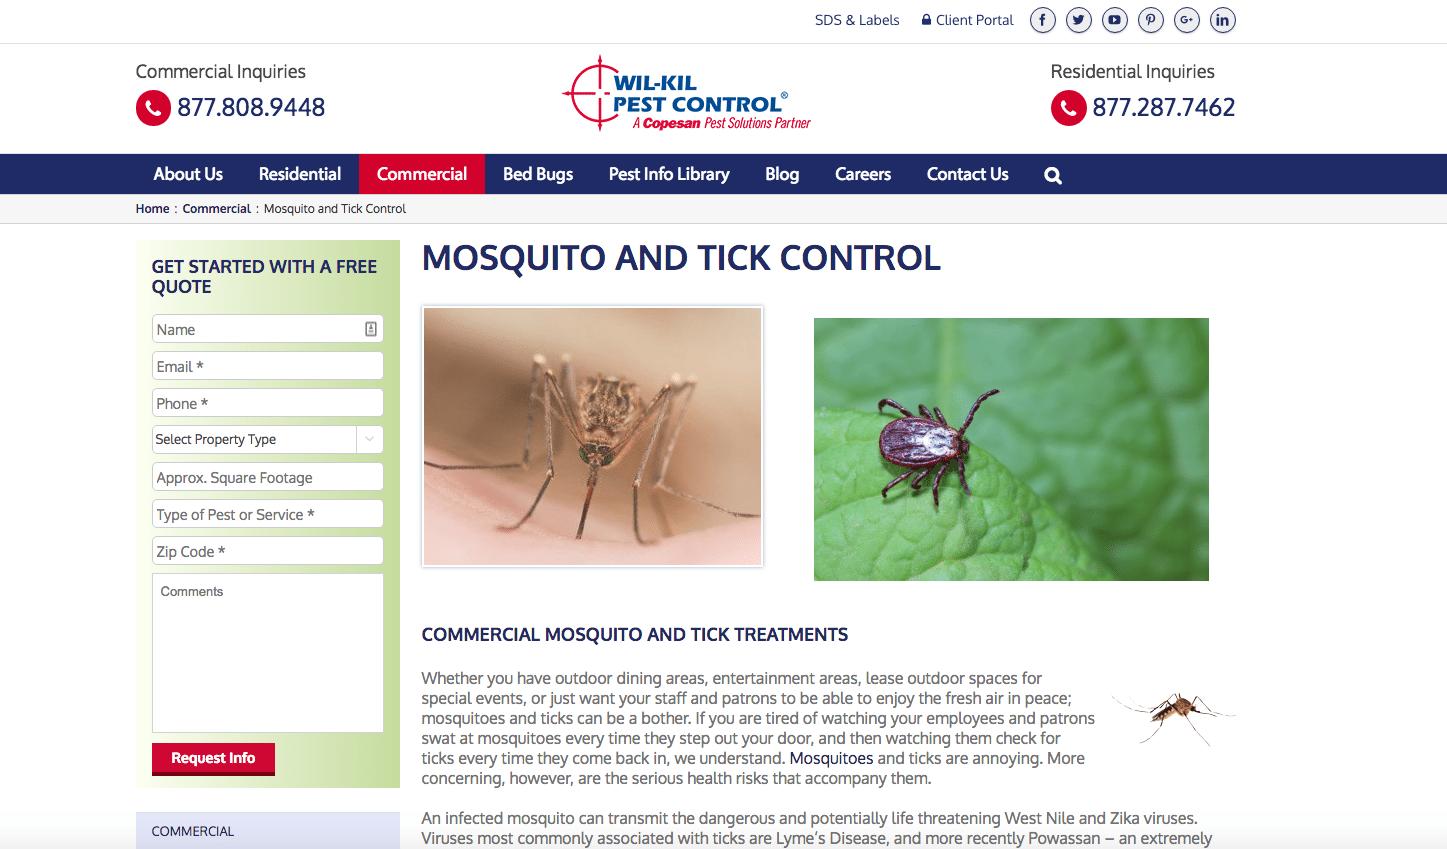 Wil-Kil pest library webpage